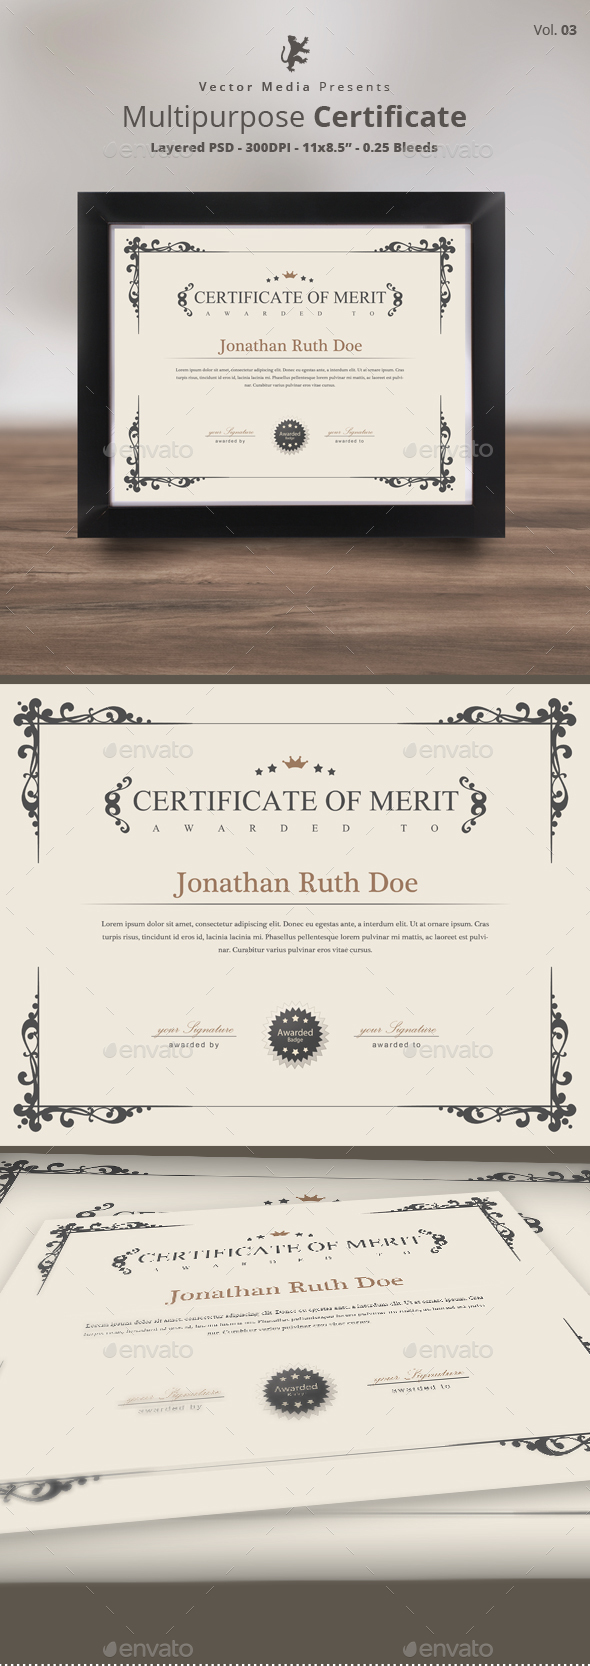 Multipurpose Certificate [Vol.03] - Certificates Stationery